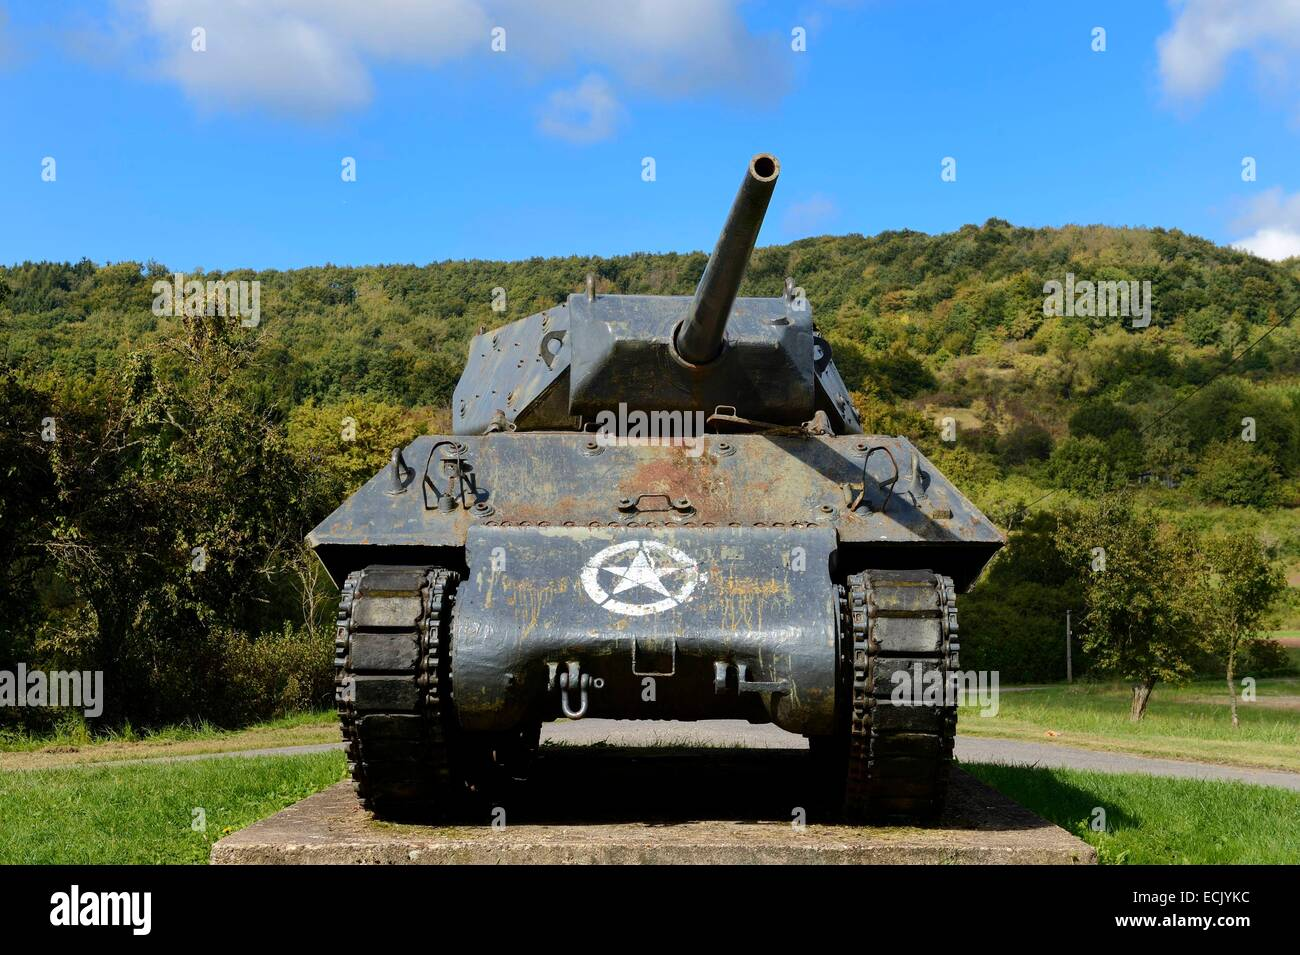 Francia, Moselle, Veckring, Línea Maginot, tanque estadounidense en frente de la colina de la fortaleza Hackenberg Imagen De Stock